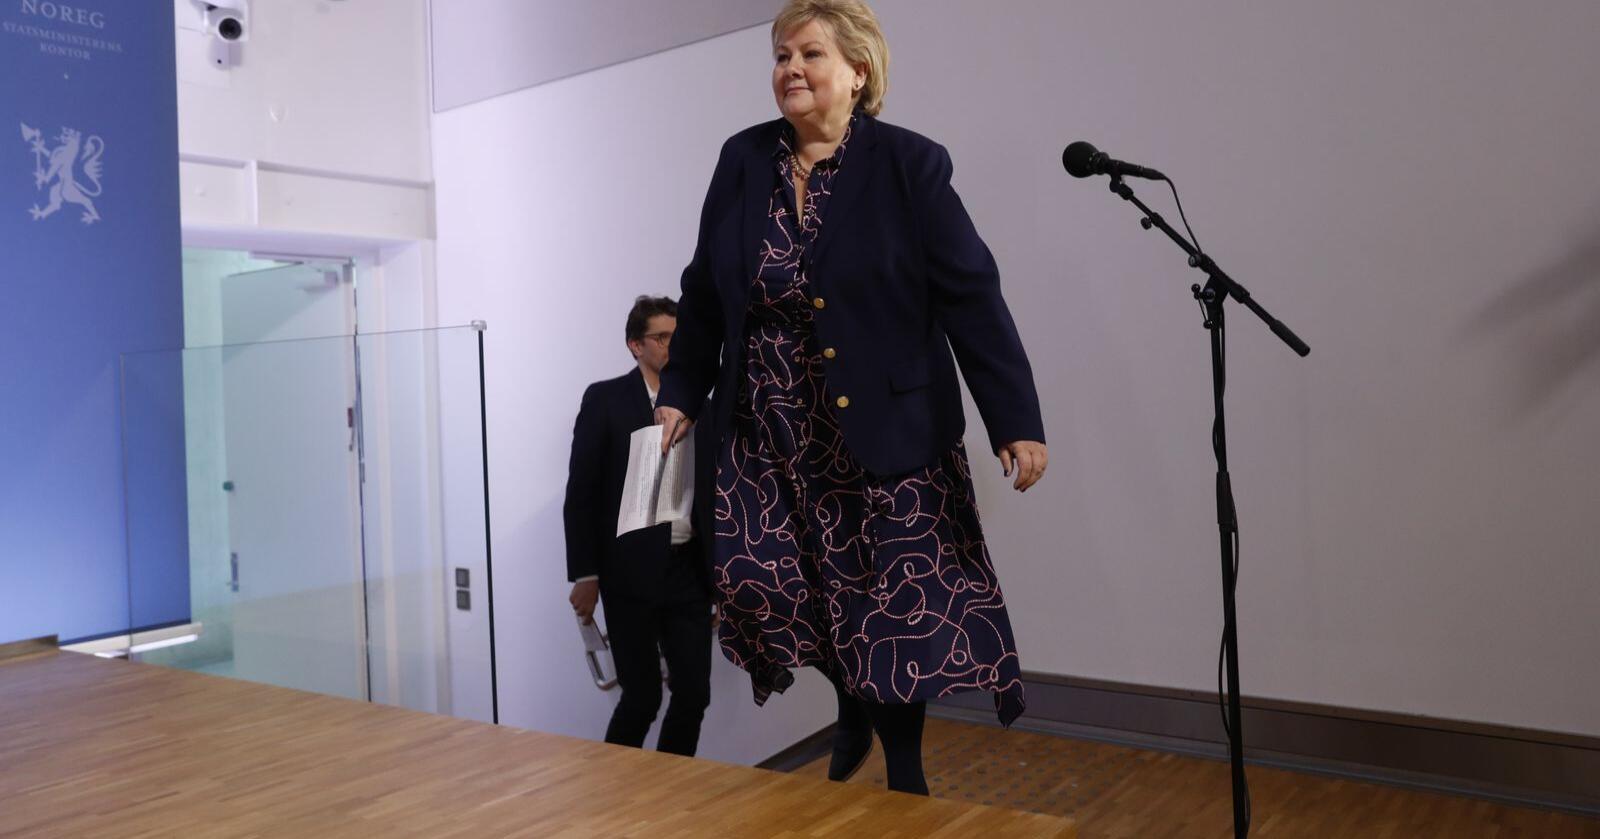 Erna Solberg kommenterte Frps regjerings-exit mandag. Foto: Terje Bendiksby / NTB scanpix